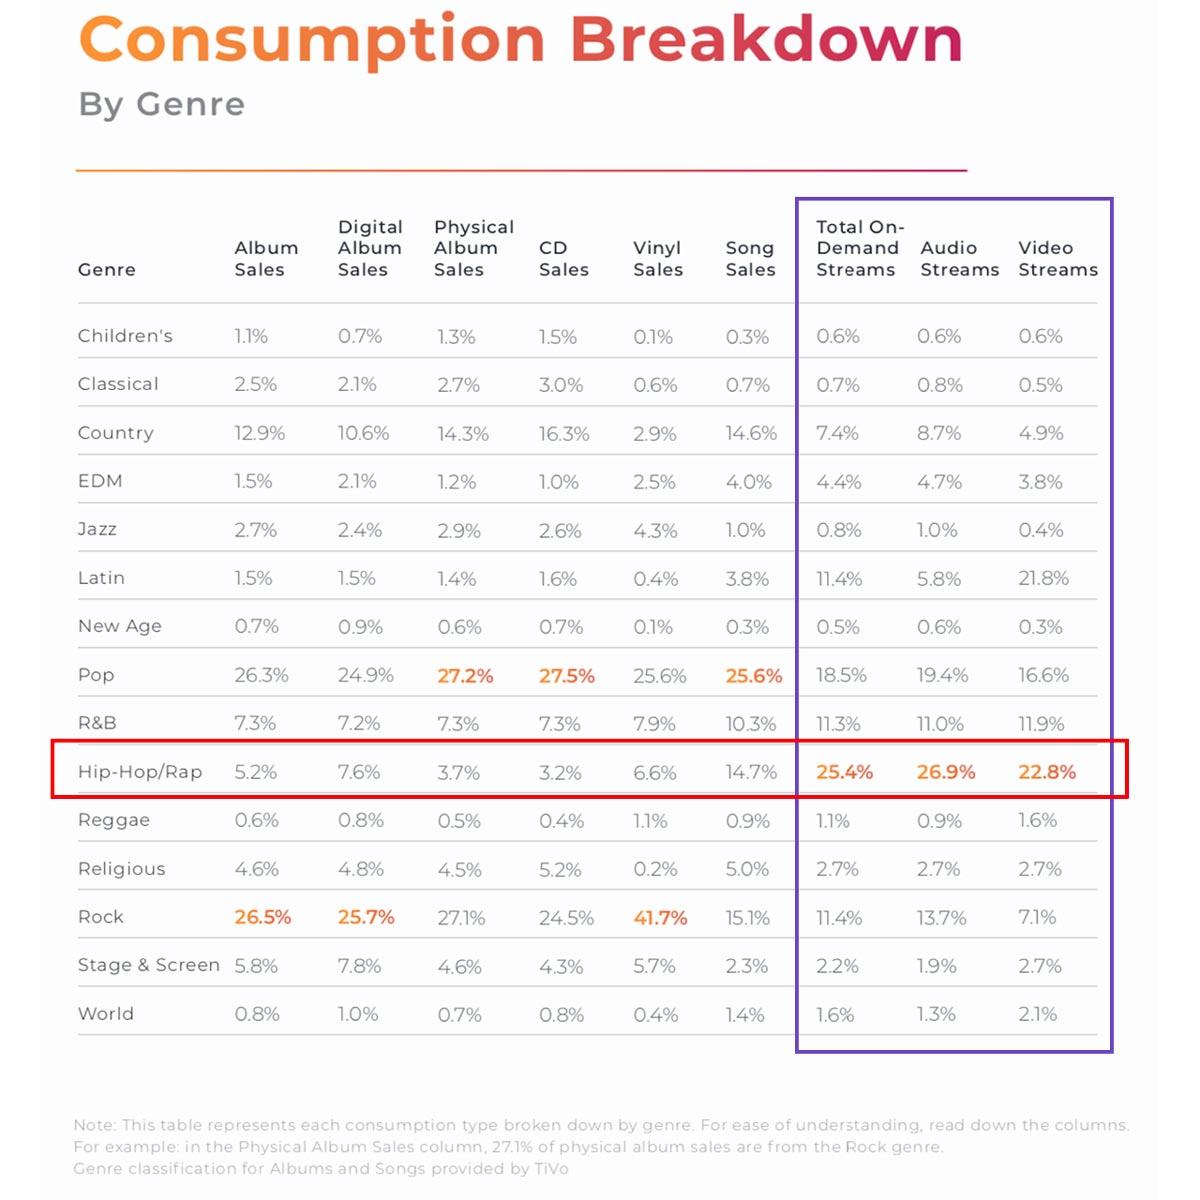 Consumption Breakdown